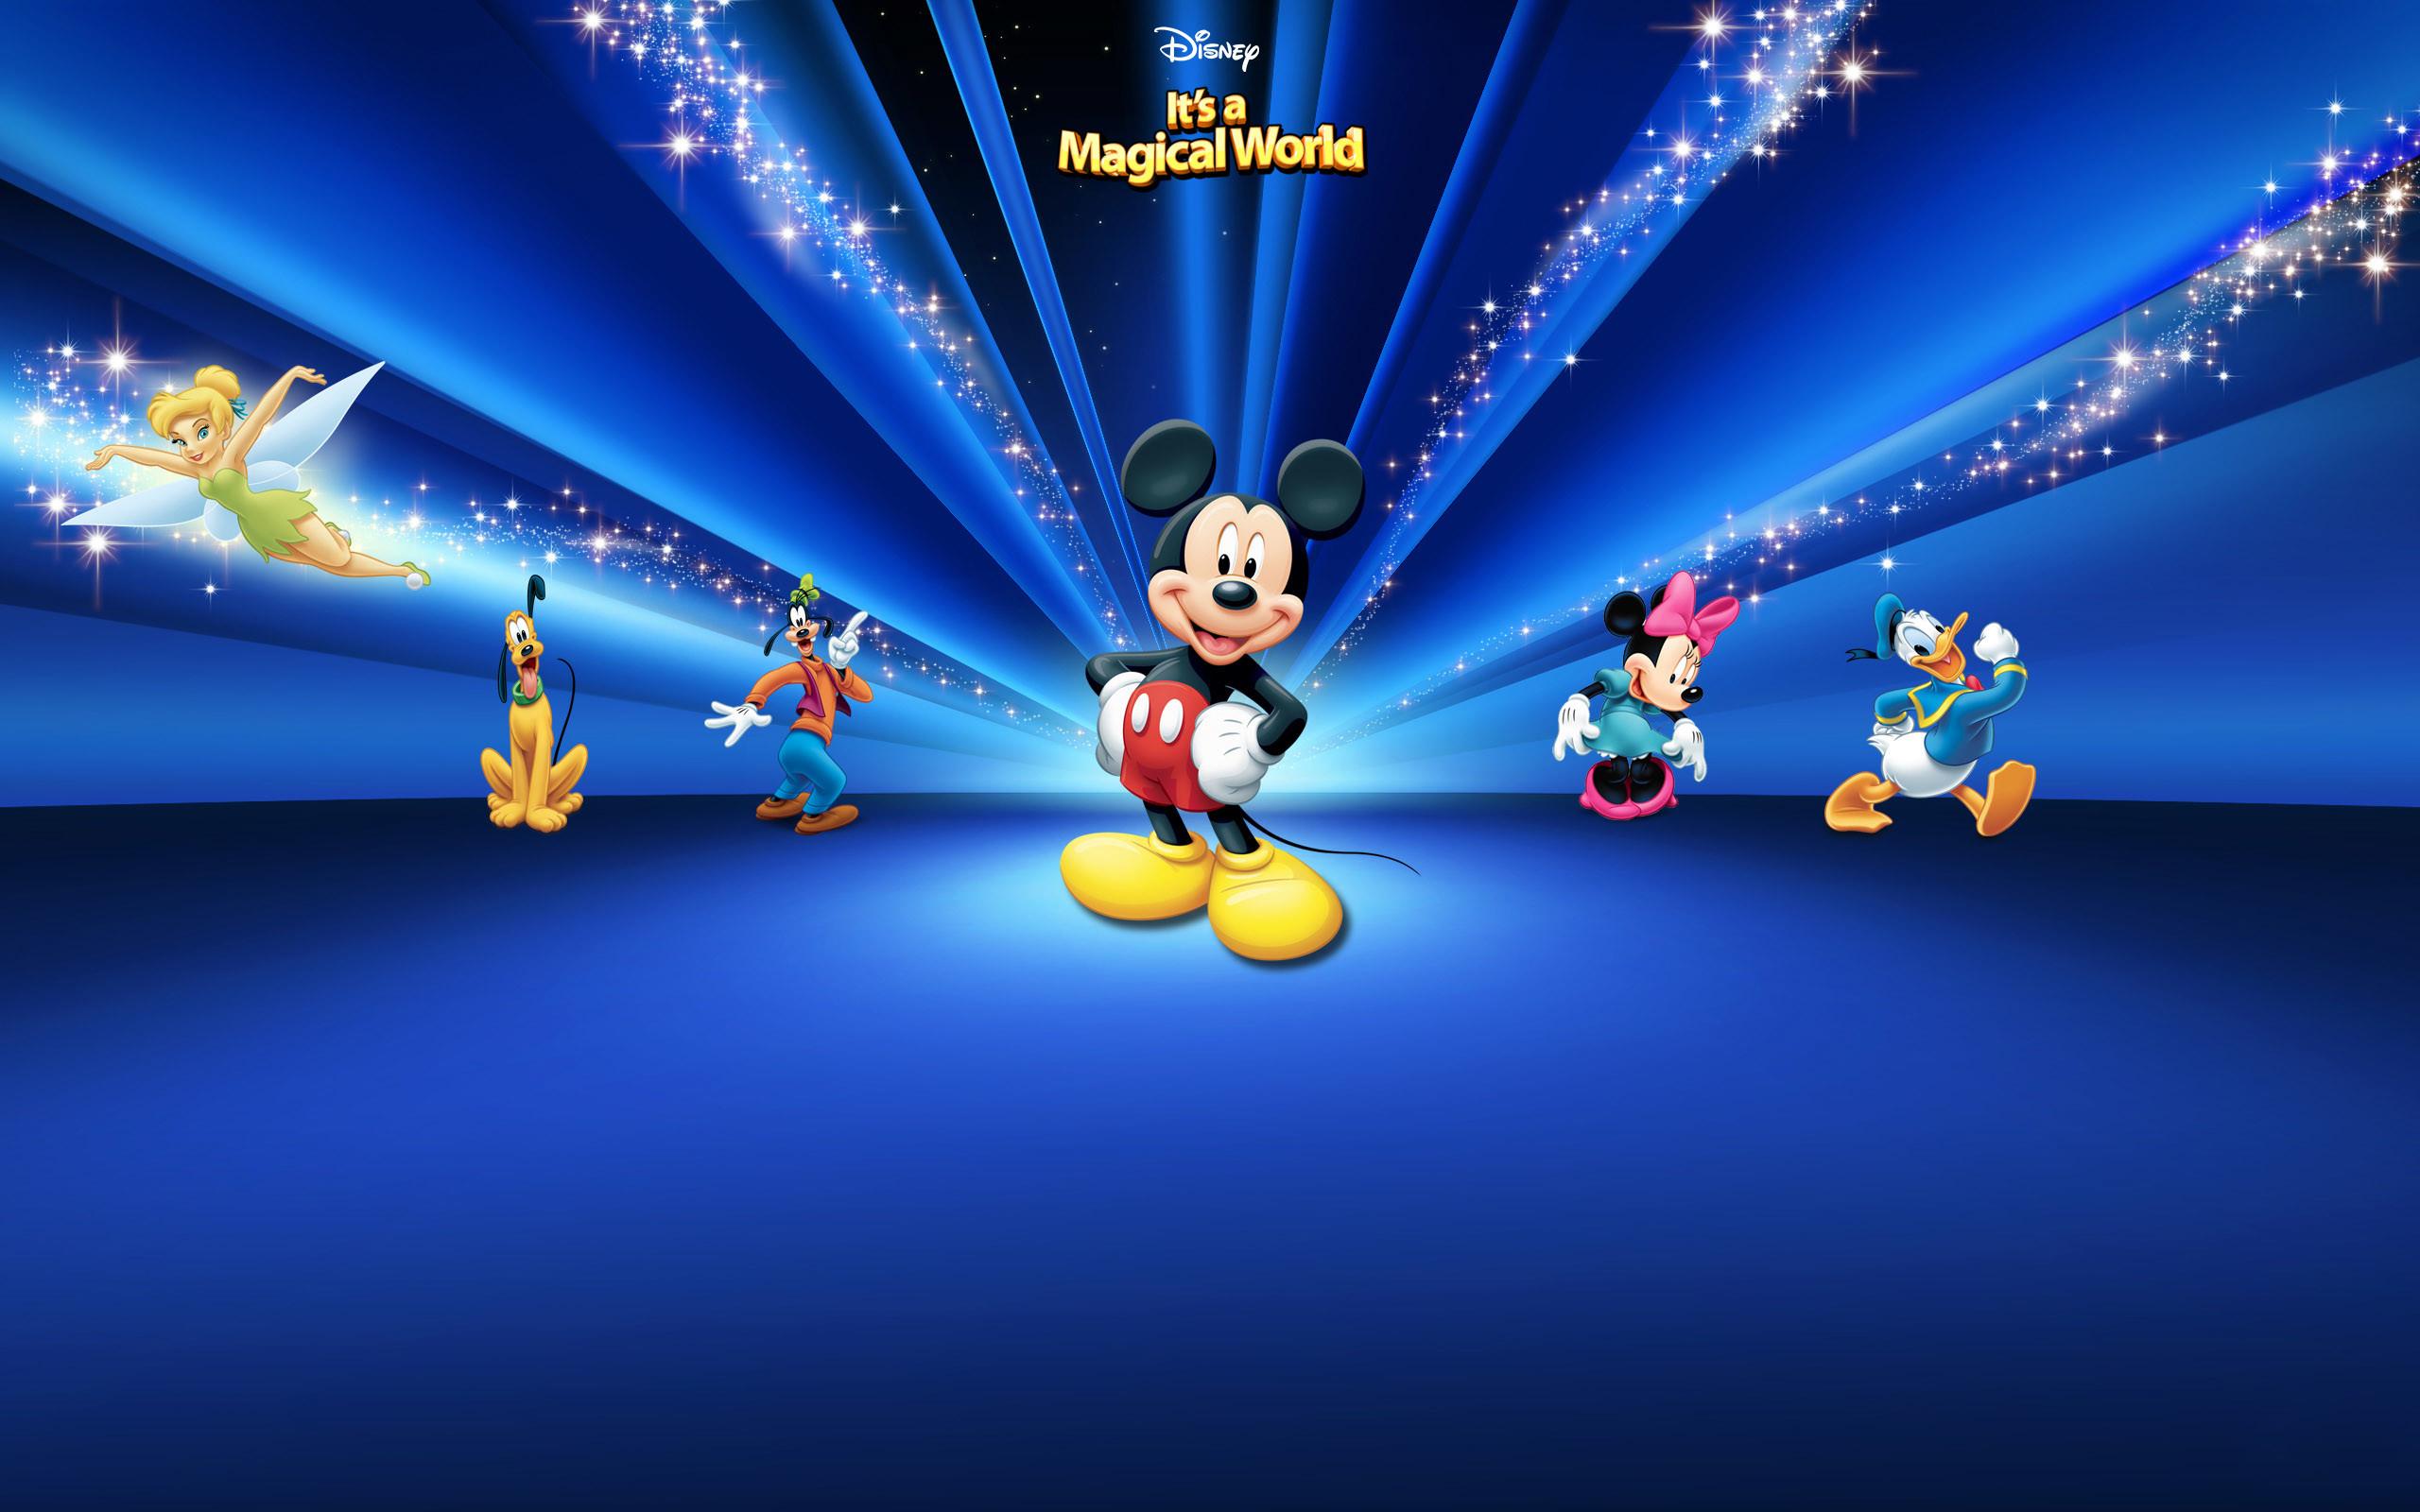 Wallpapers Free Download Hd 3d Disney Wallpaper Hd 3d Widescreen 48 Images